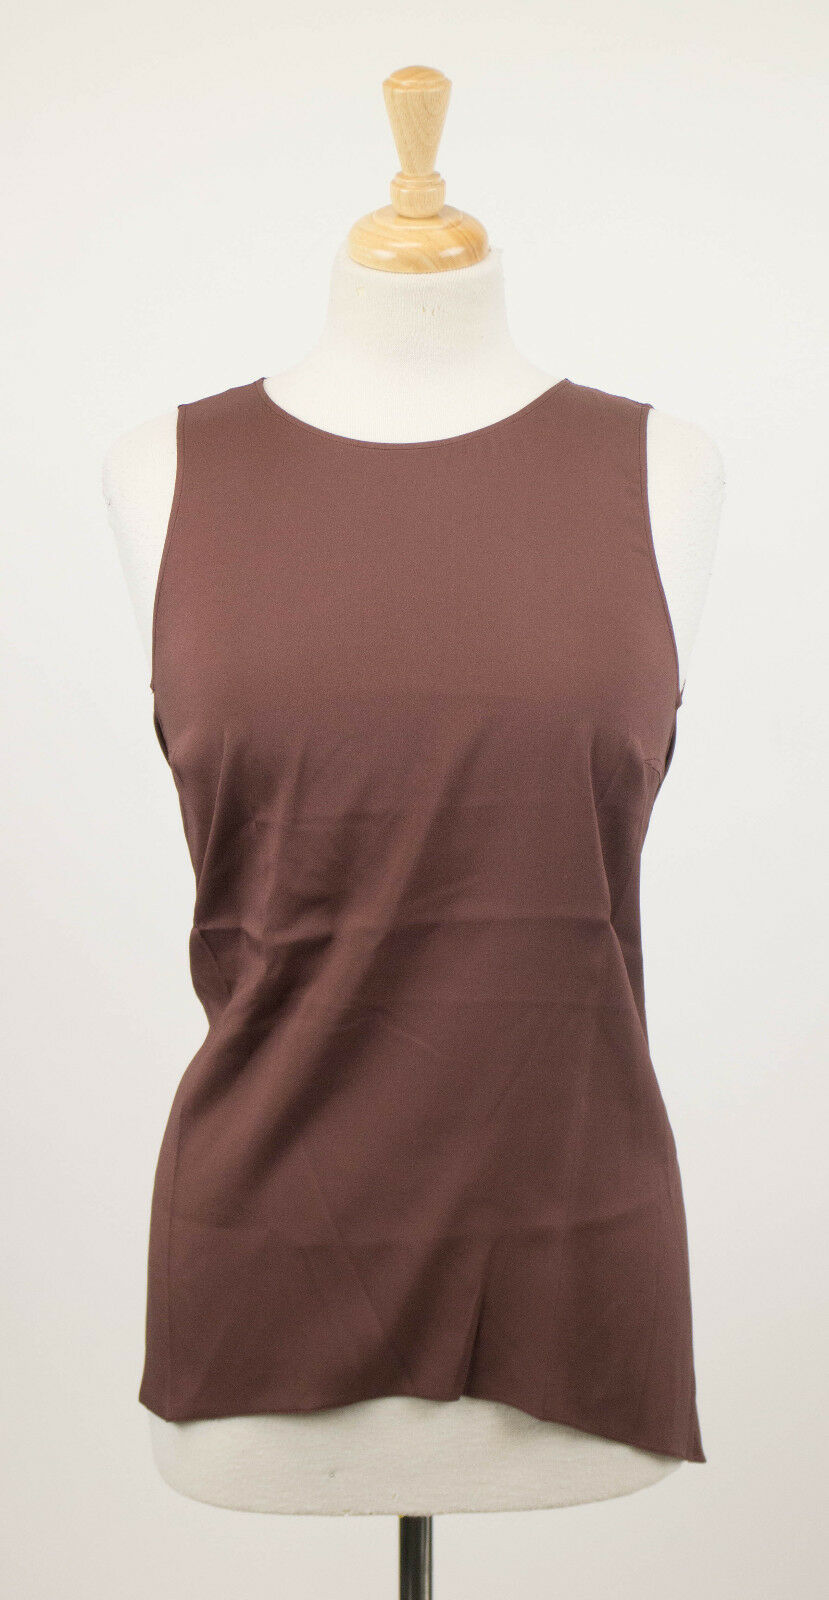 NWT BRUNELLO CUCINELLI Woman's Braun Silk Blend Blouse Shirt Top Größe M 805